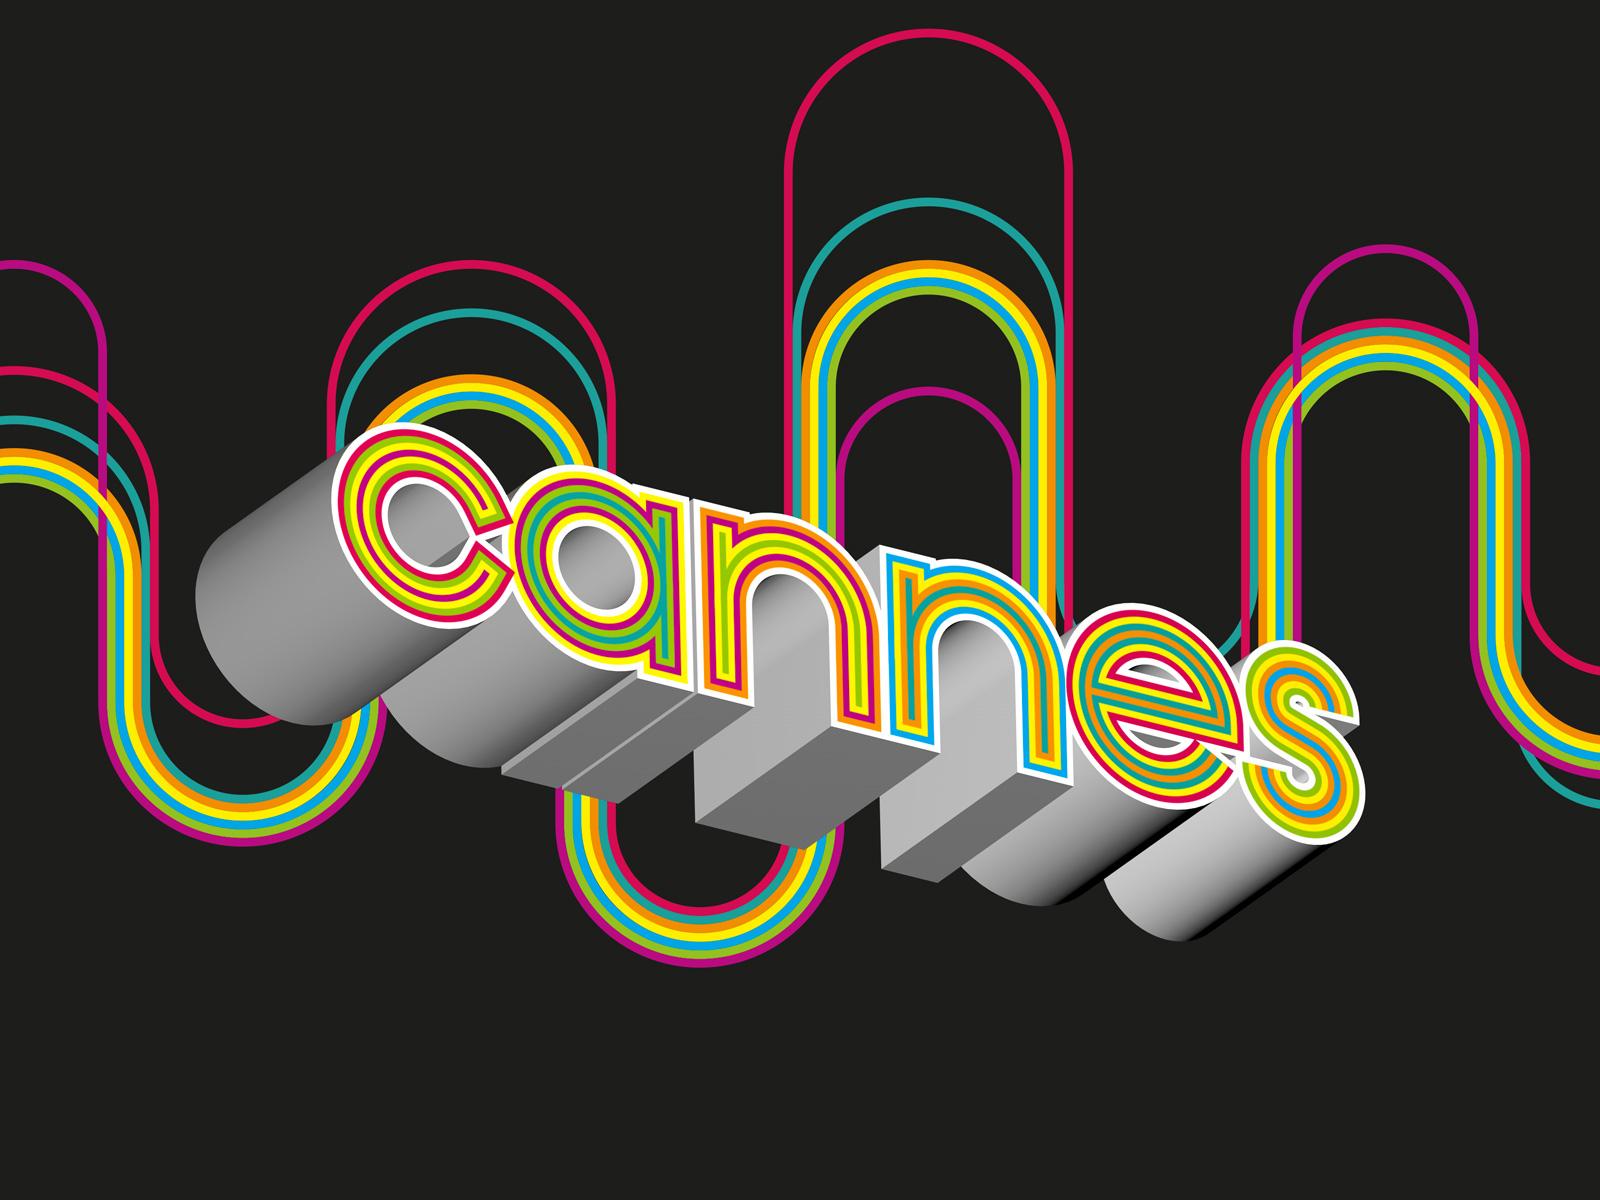 etche-art-francisco-etchepareborda-cannes-typeface